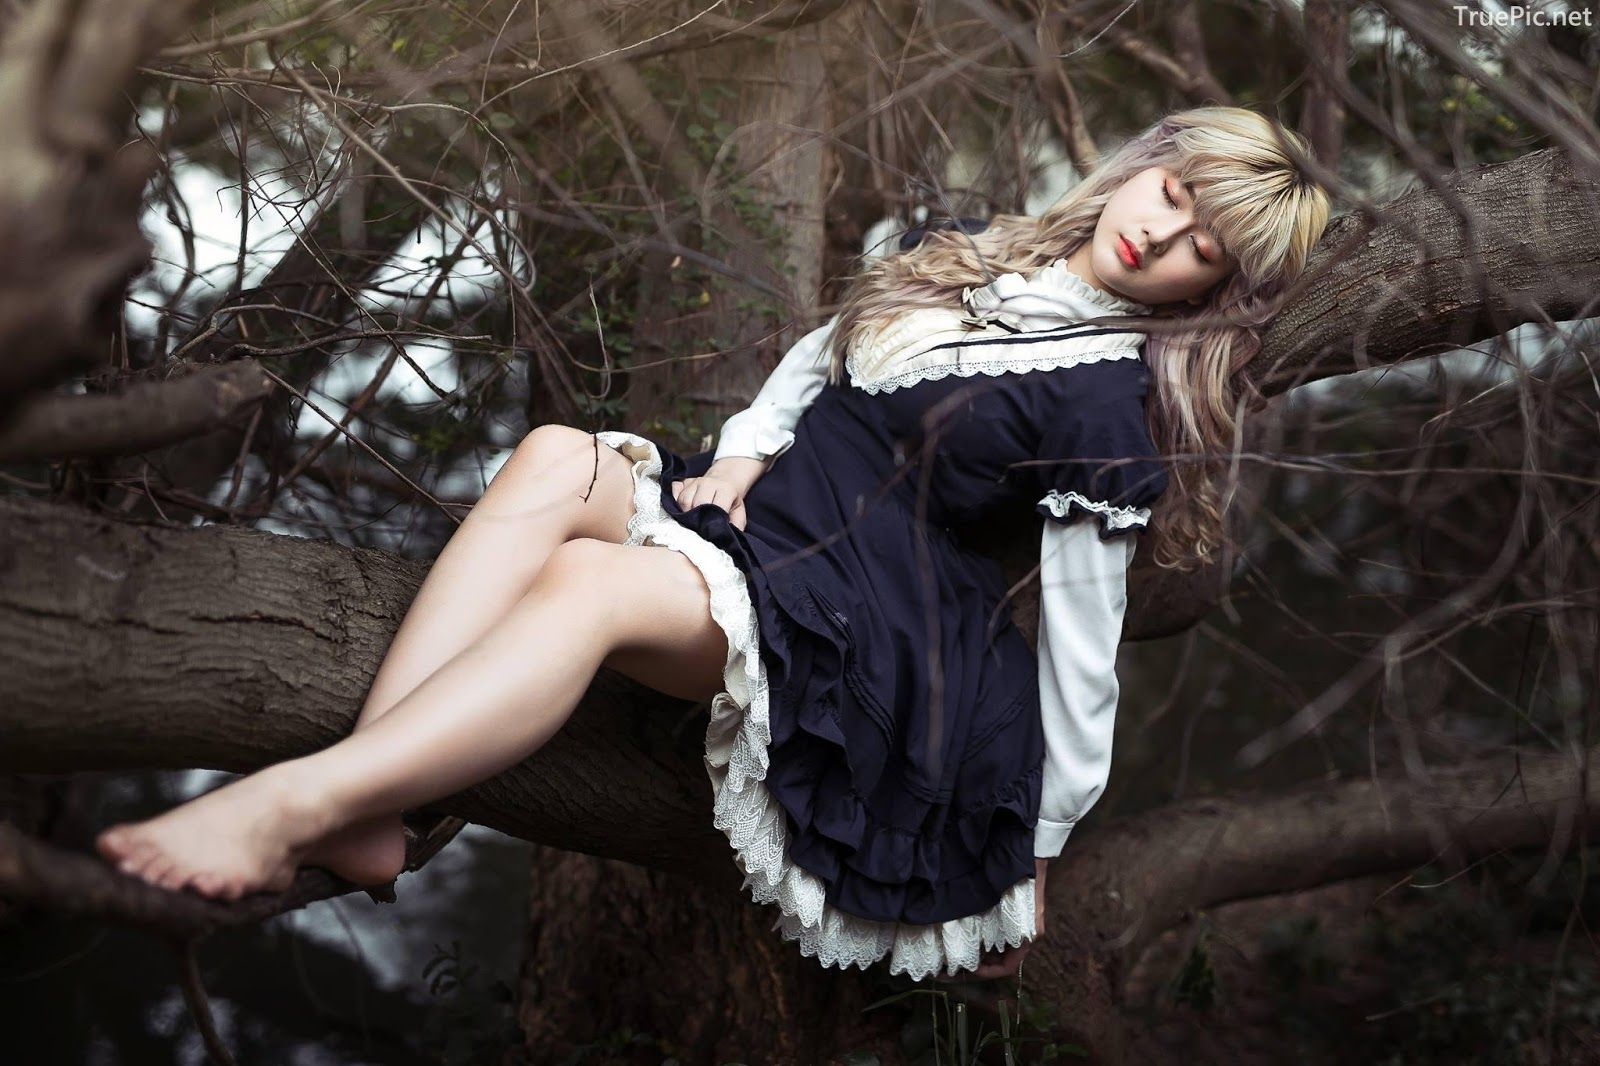 Thailand model - บวรรัตน์ มณีรัตน์ (Nia) - Lost in wonderland - Picture 1